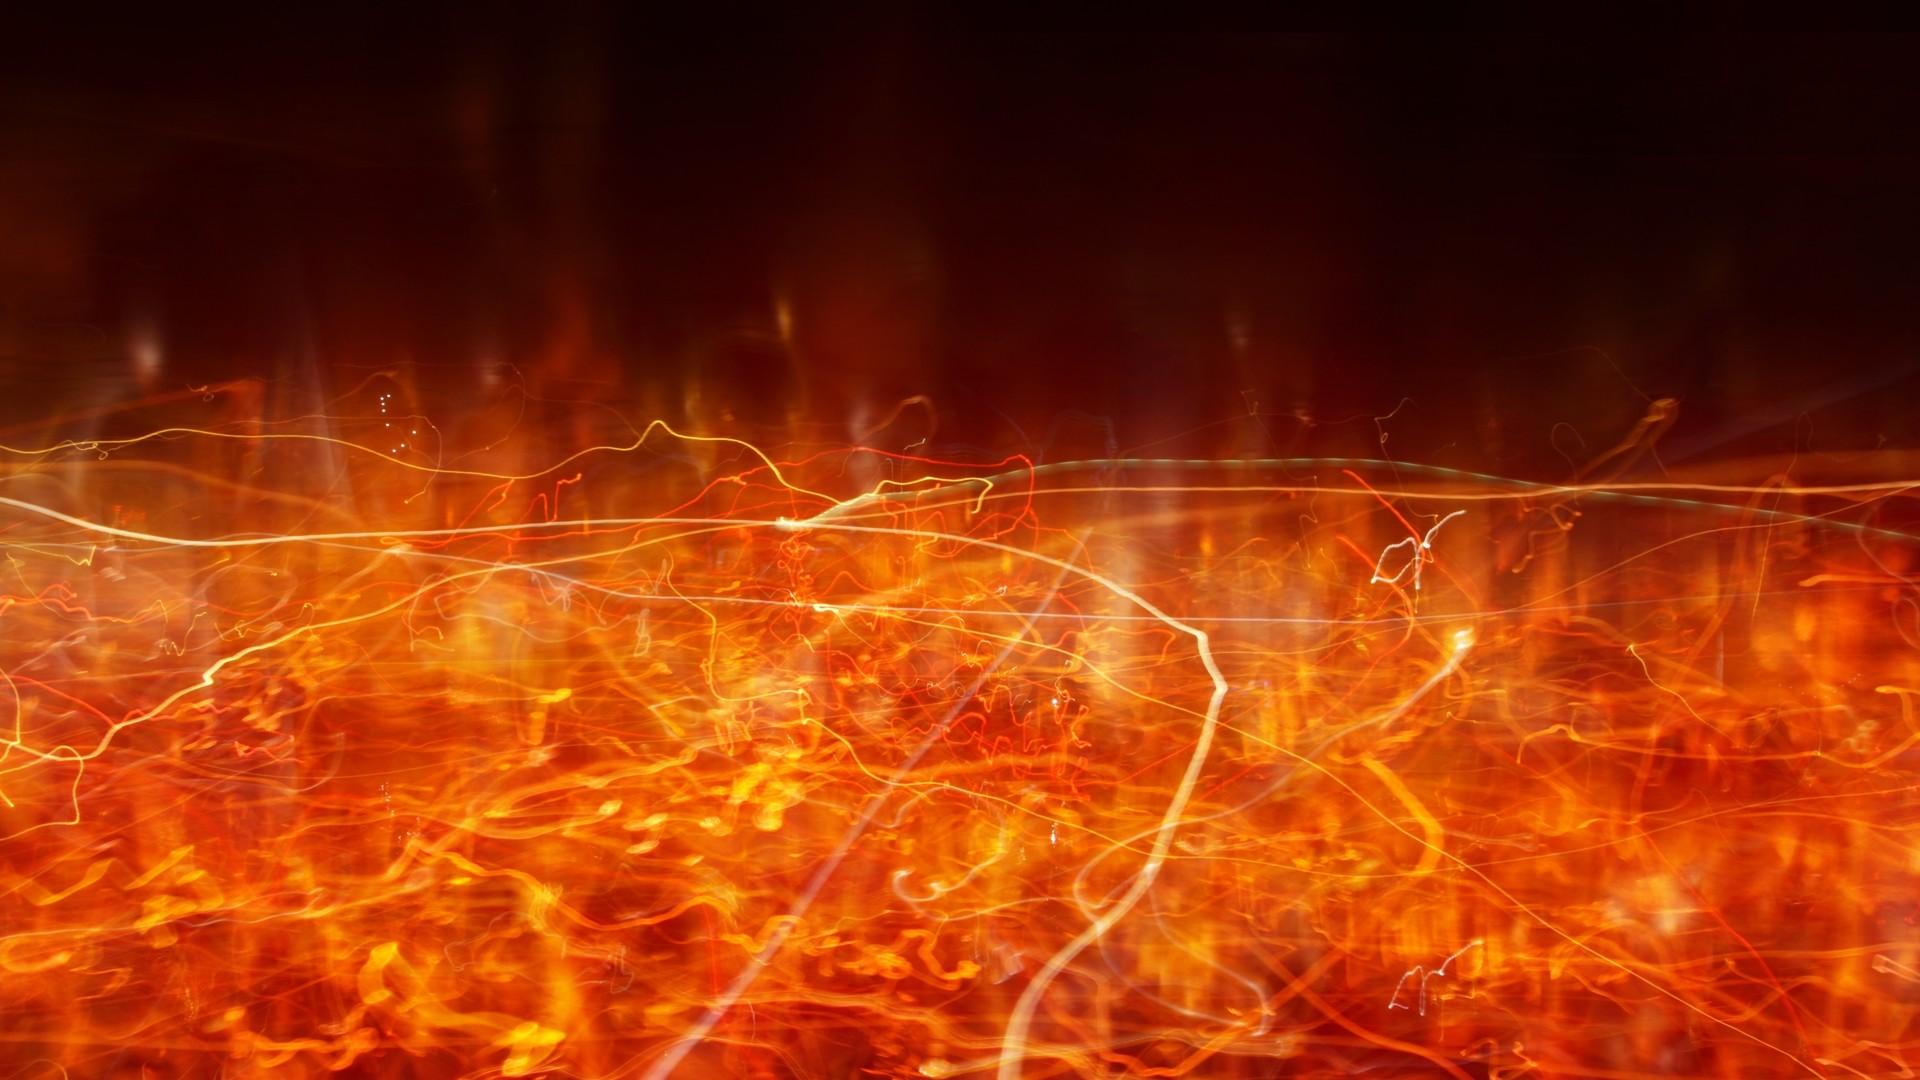 Wallpaper surface, fire, background, dark